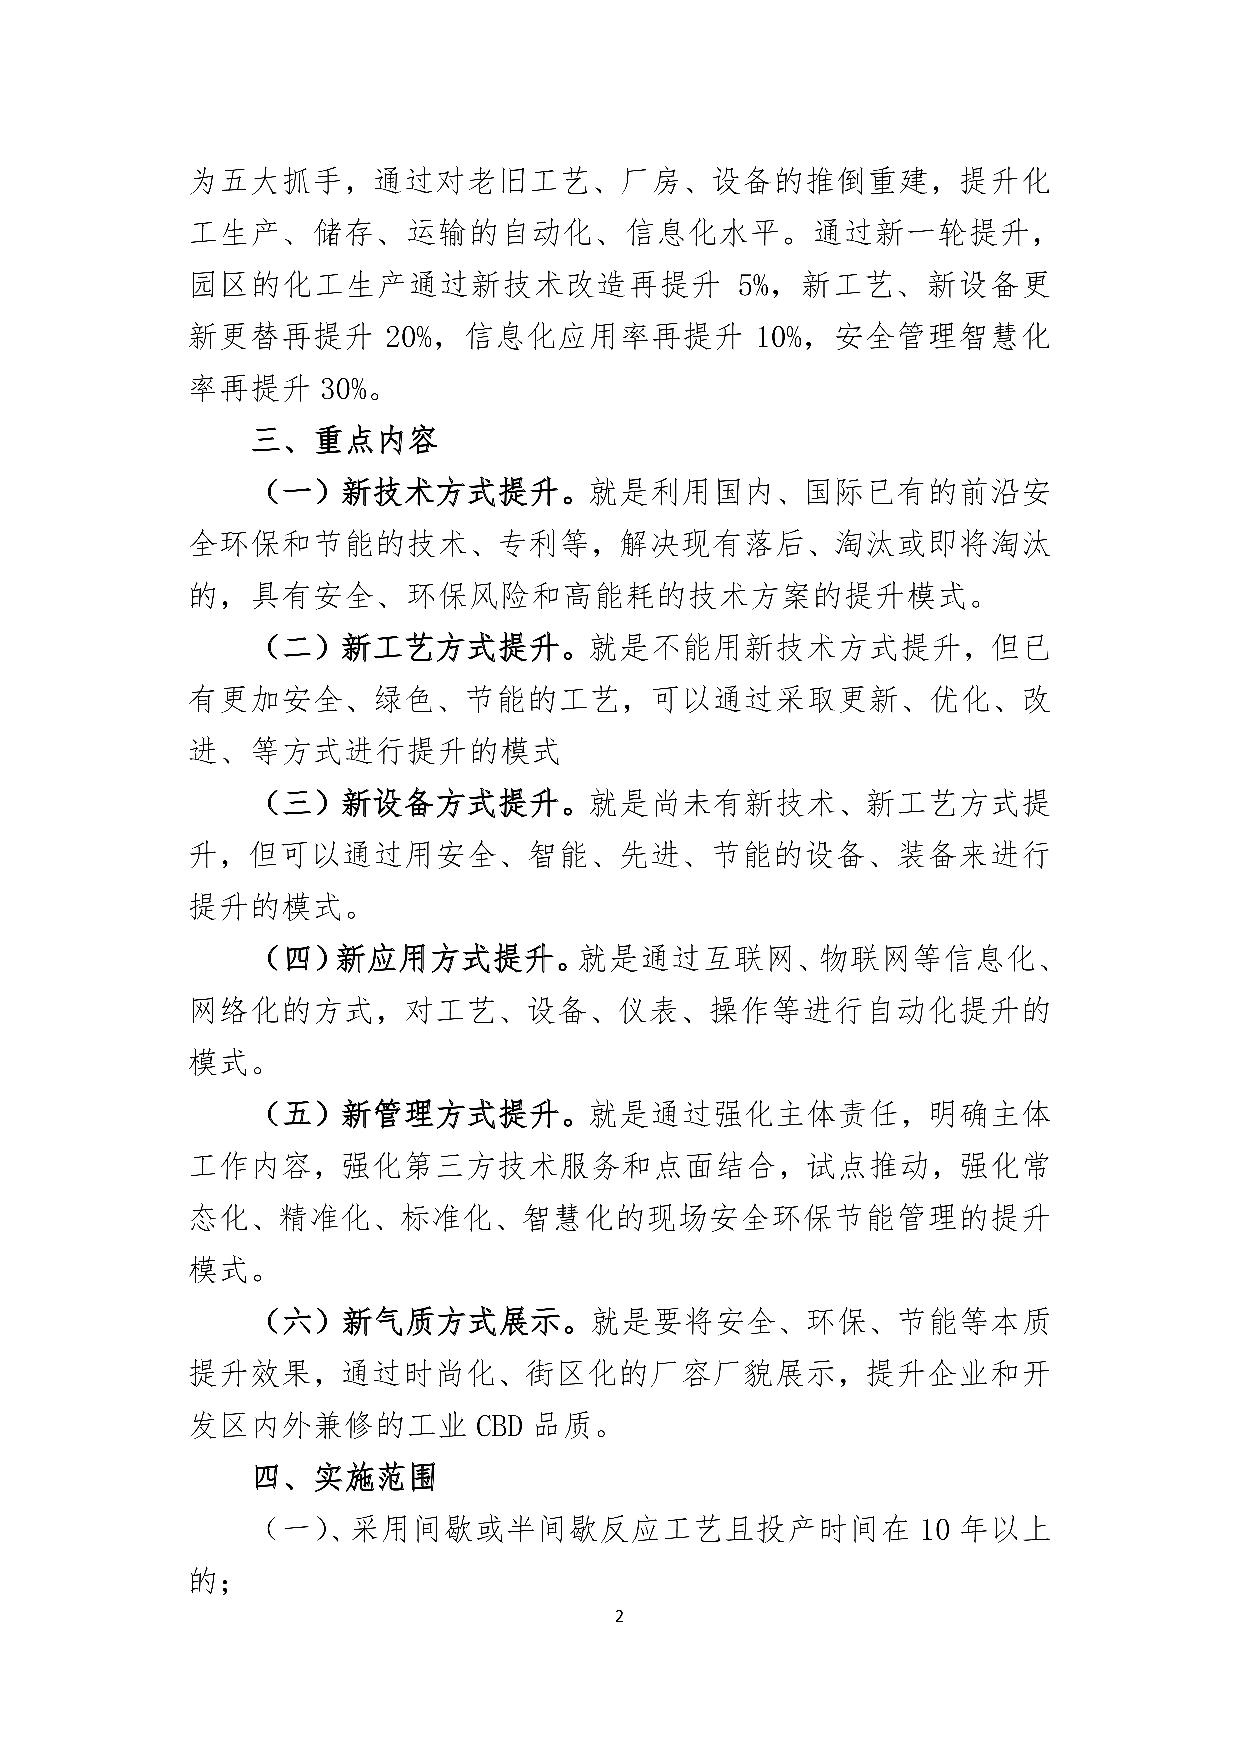 "C_Users_hy_Desktop_杭州湾上虞经济技术开发区化工行业""六新""改造提升实施方��?pdf2.jpg"